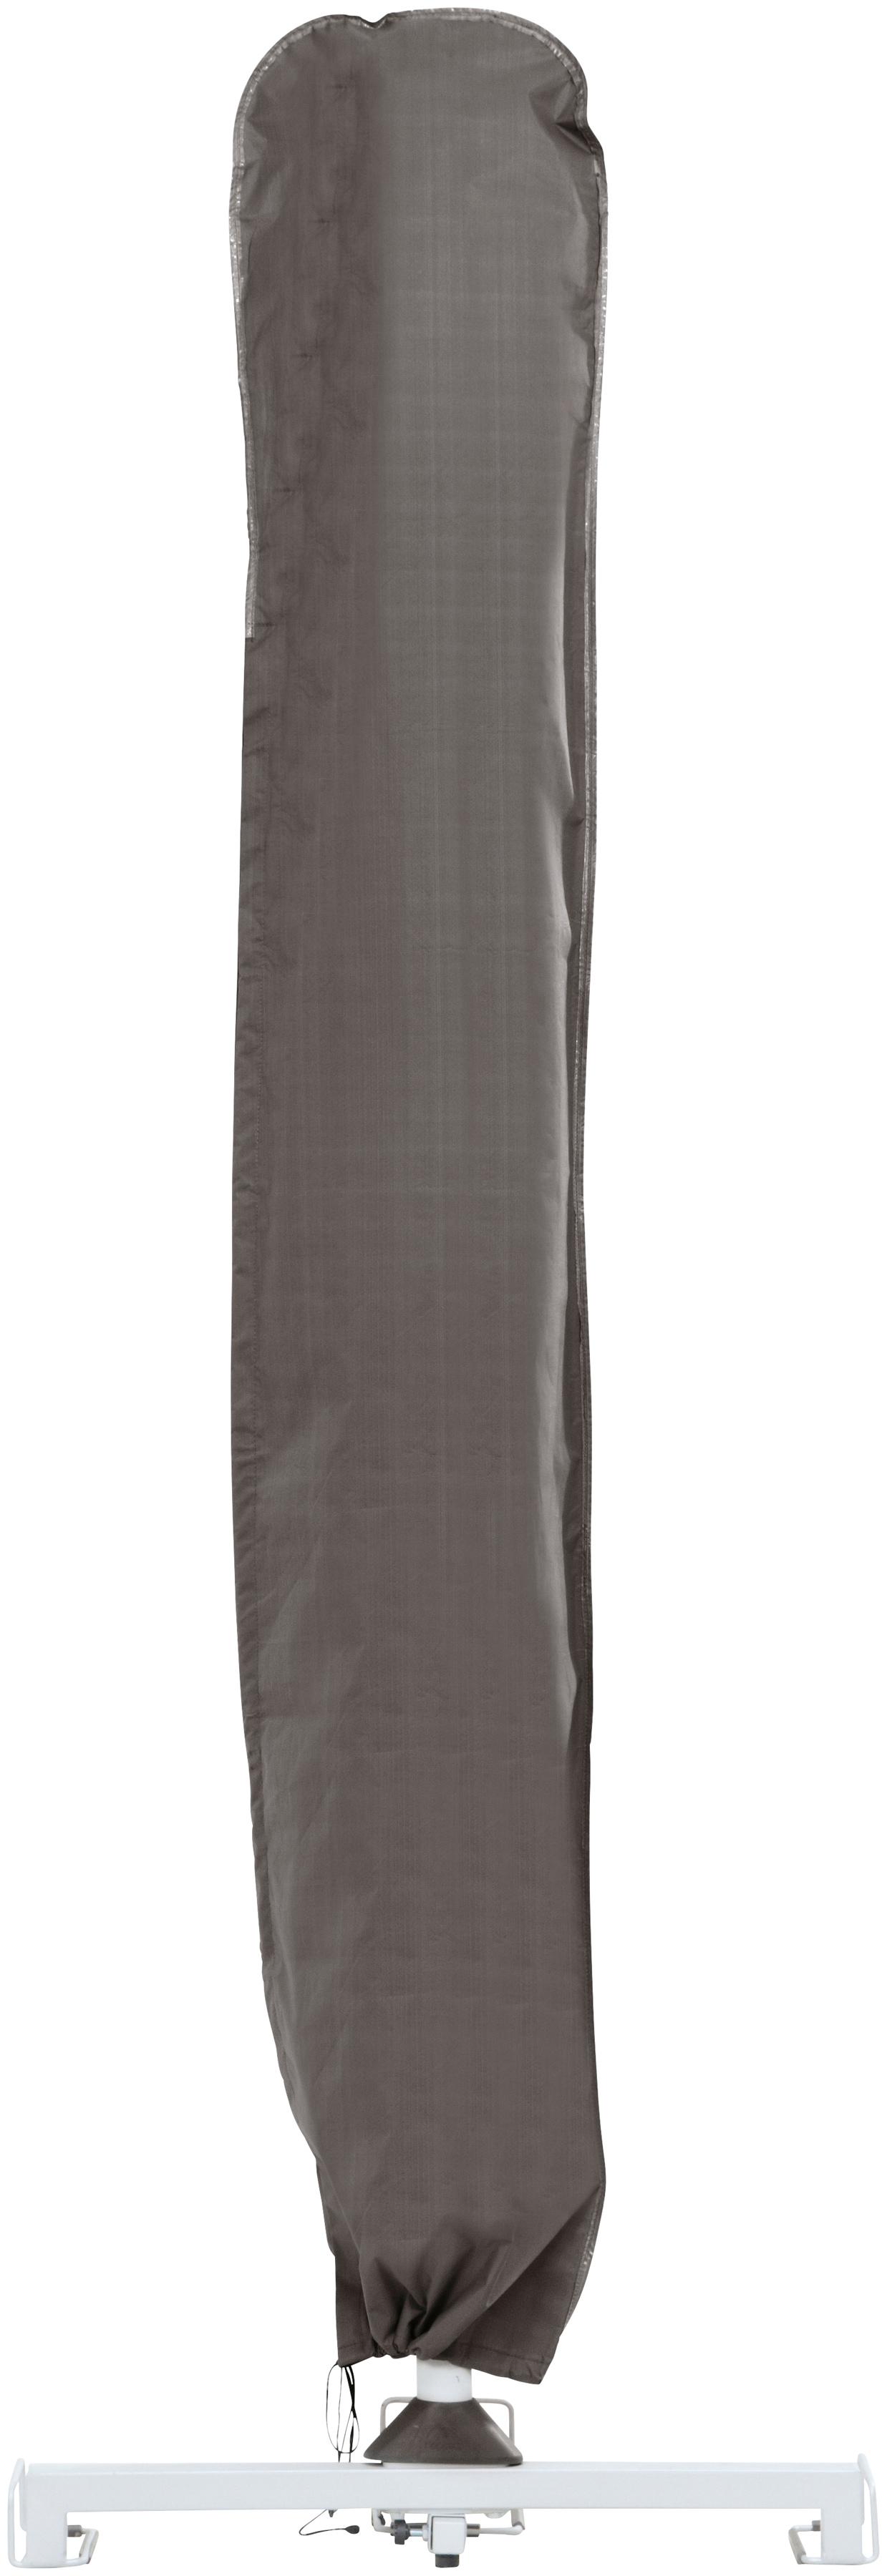 Best Schutzplane, (L/B): ca. 220x30 cm grau Gartenmöbel-Schutzhüllen Gartenmöbel Gartendeko Schutzplane